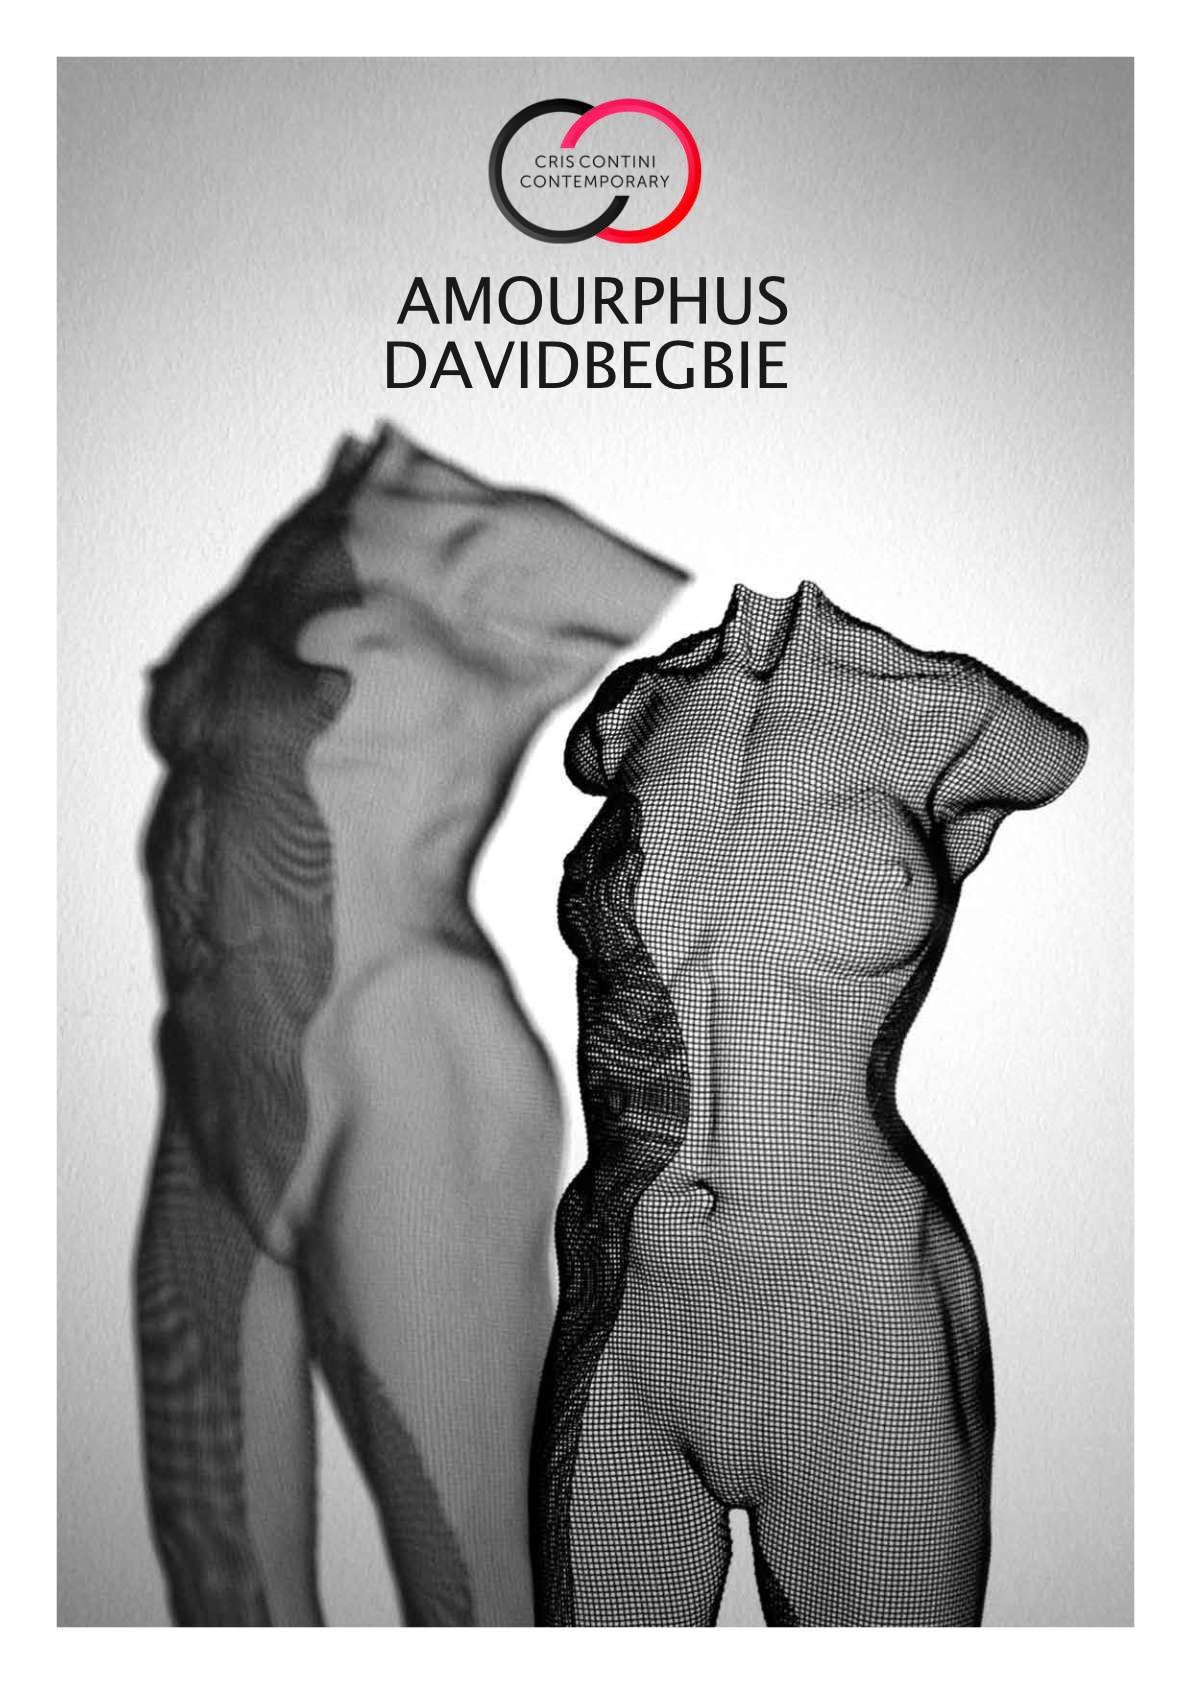 AMOURPHUS